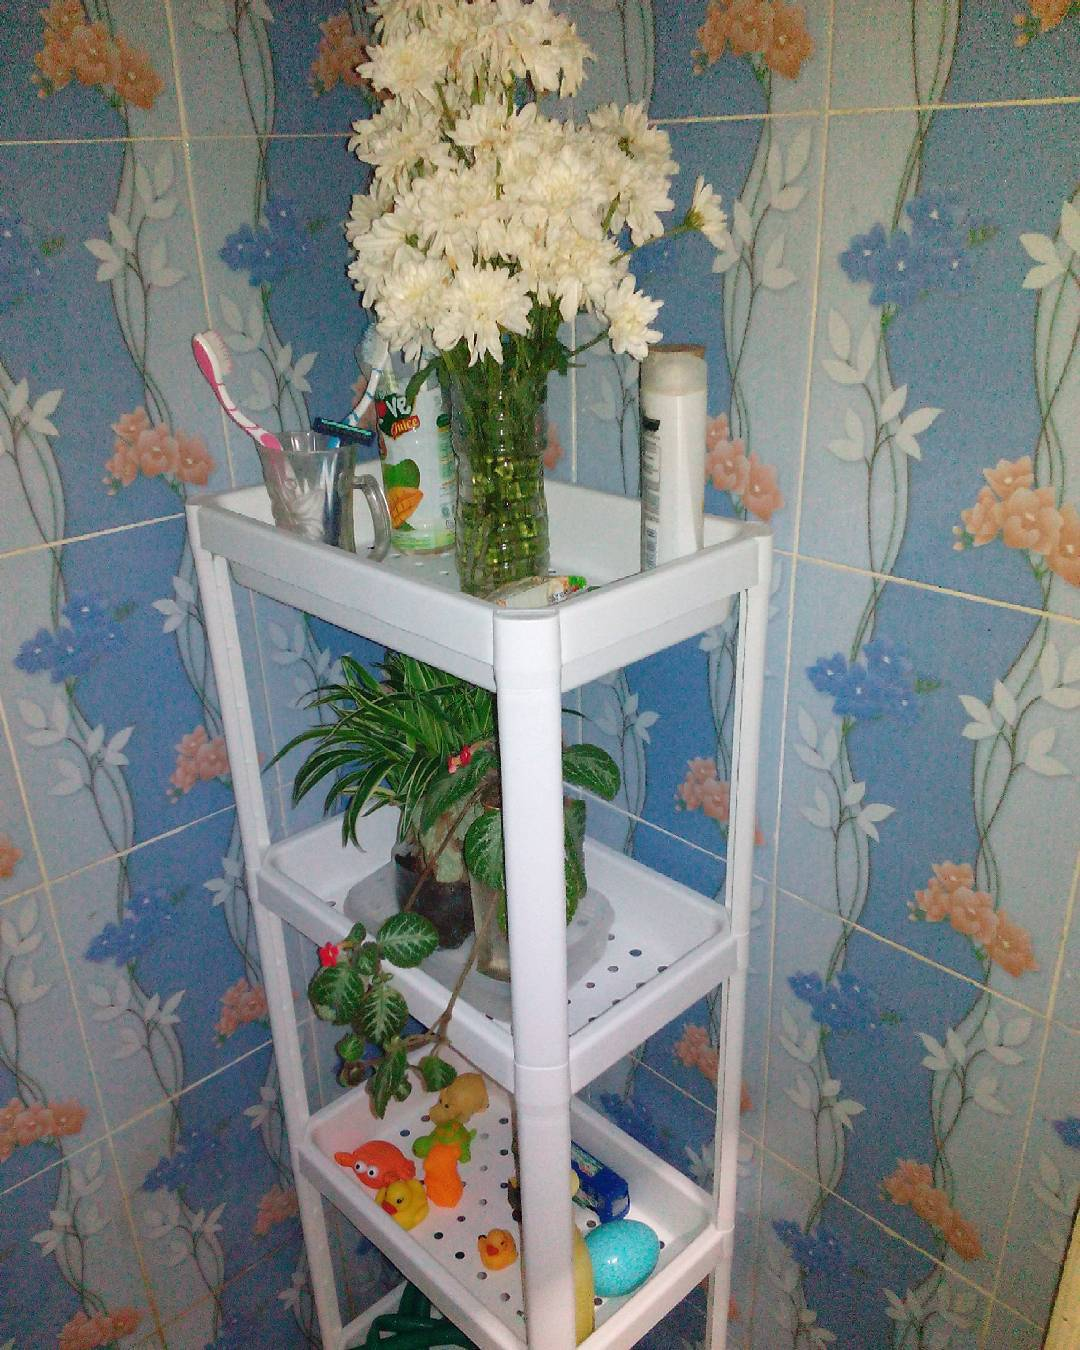 36 Model Rak Kamar Mandi Minimalis Kecil Tempat Sabun Sampo Dll 2018 Odol Toilet Organizer Untuk Dan